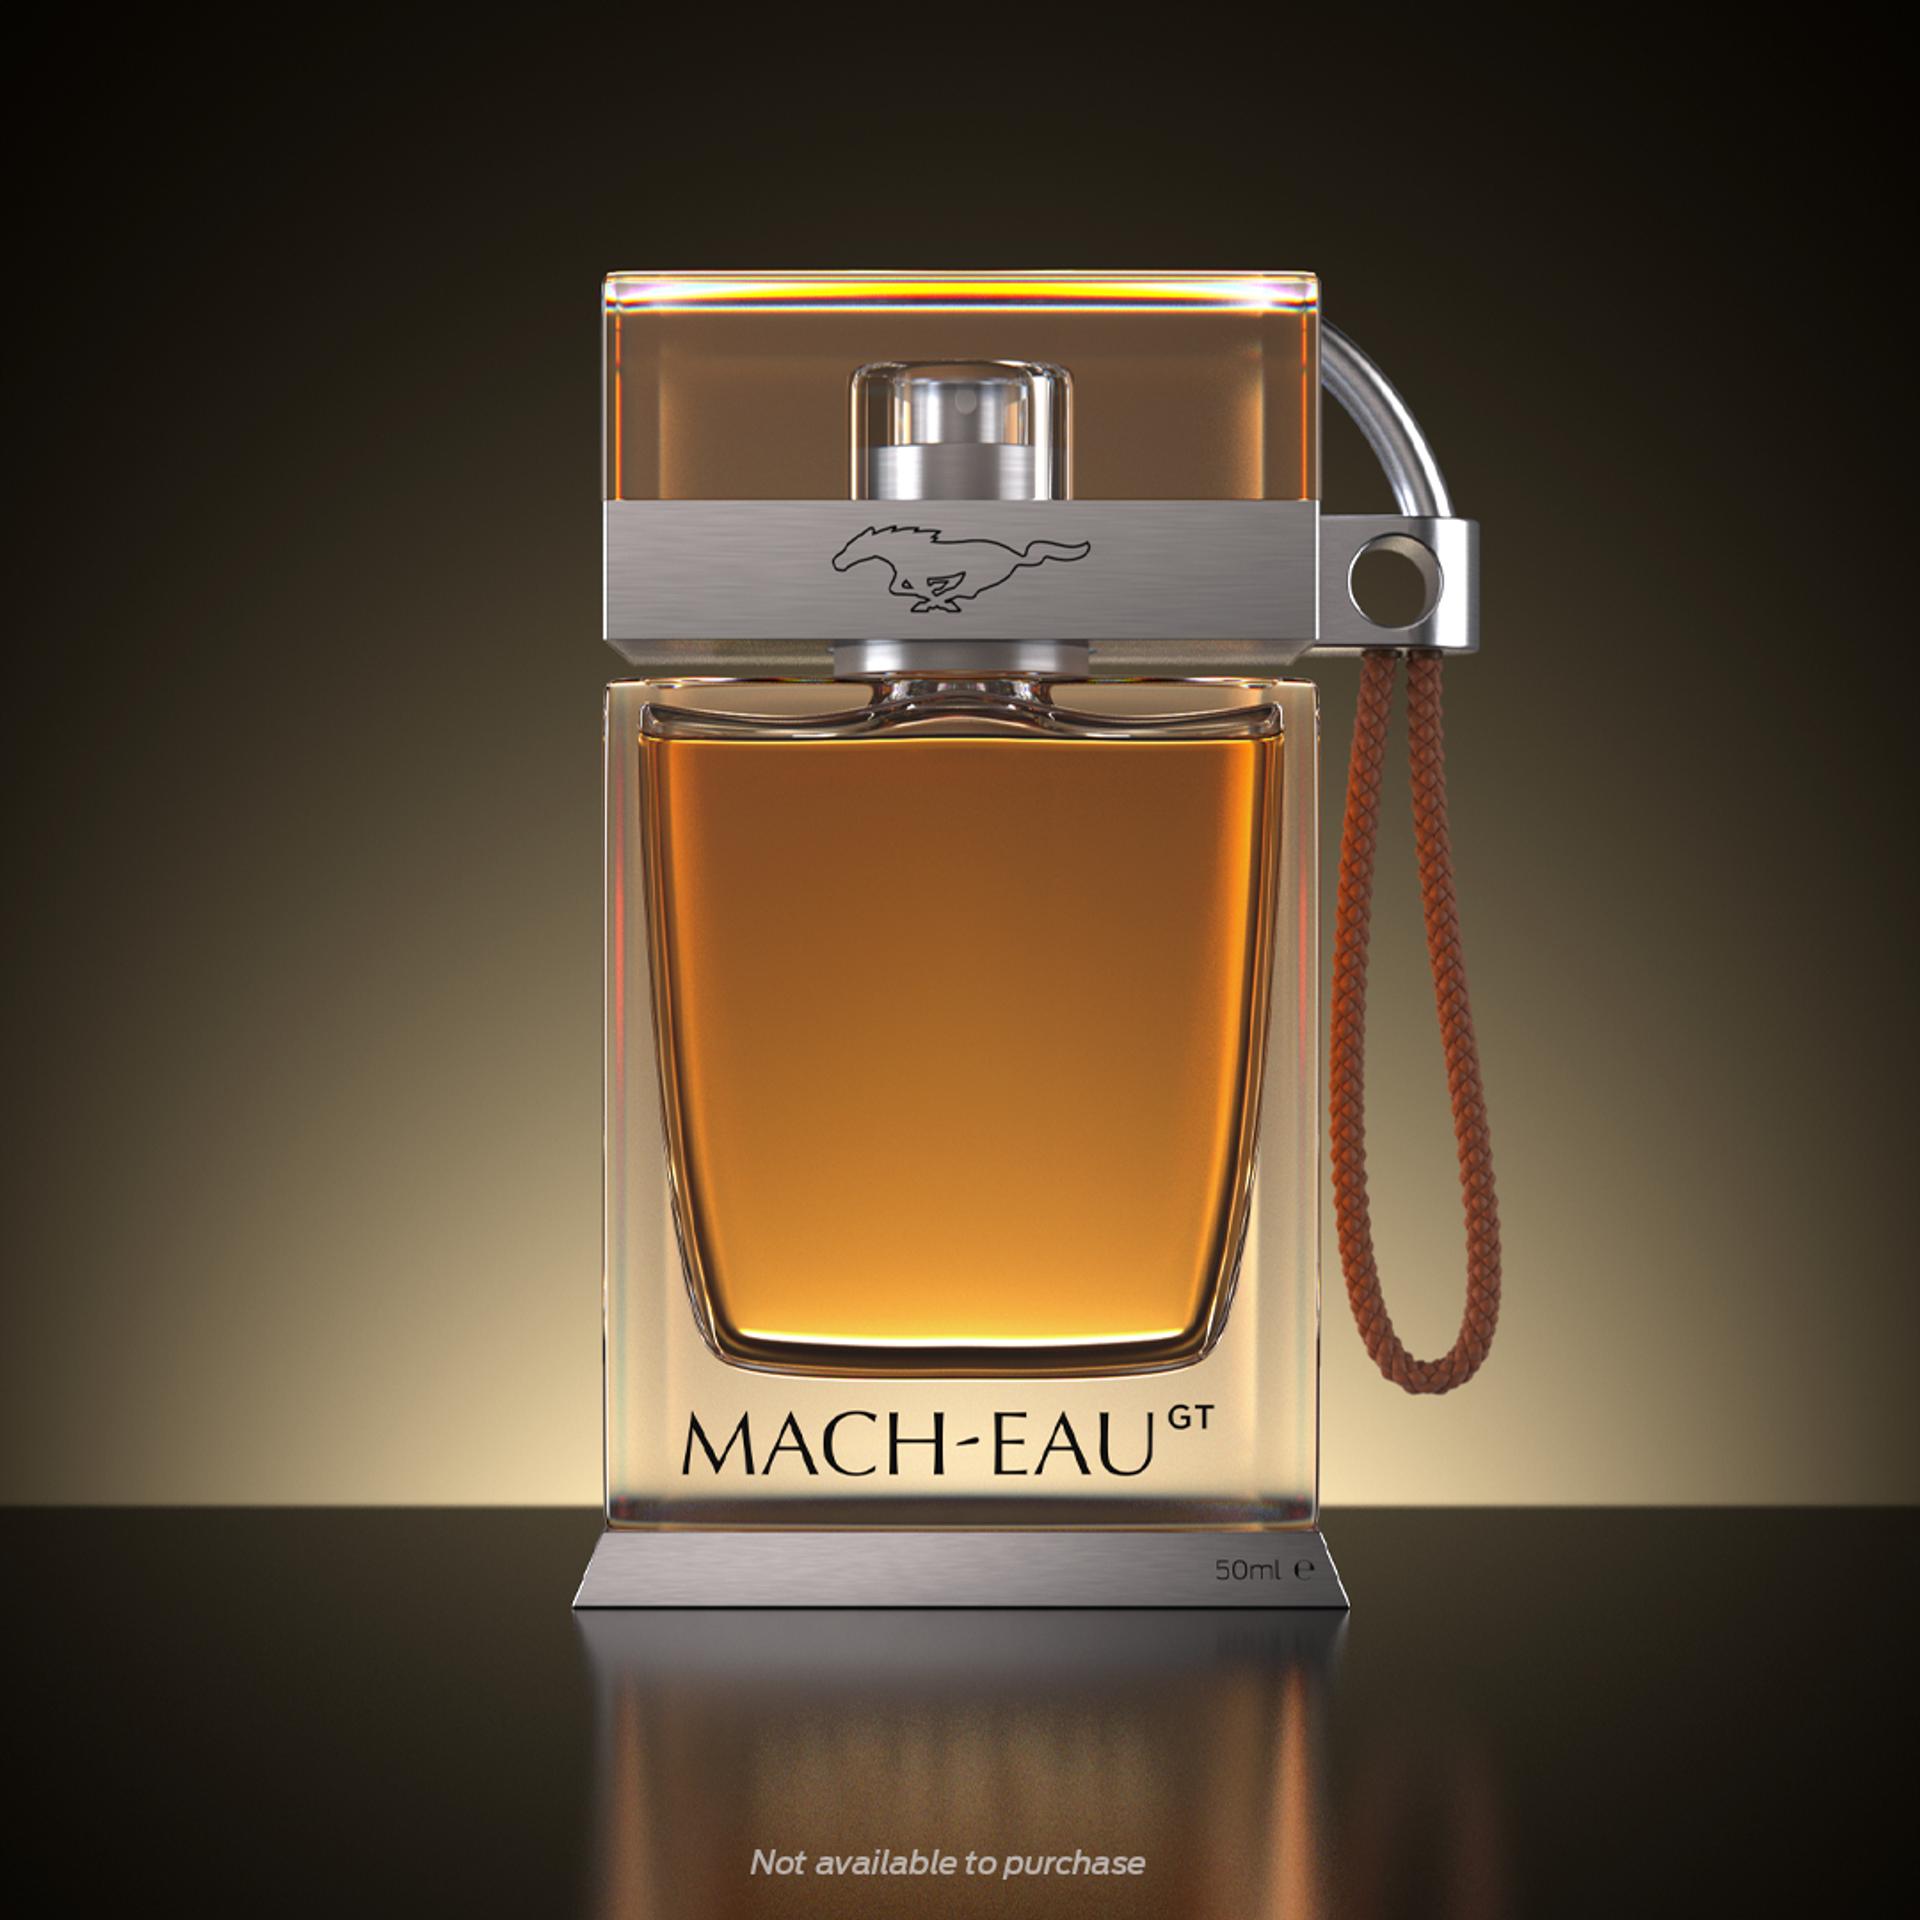 Mach-Eau, el perfume de Ford con olor a gasolina - Sputnik Mundo, 1920, 28.07.2021